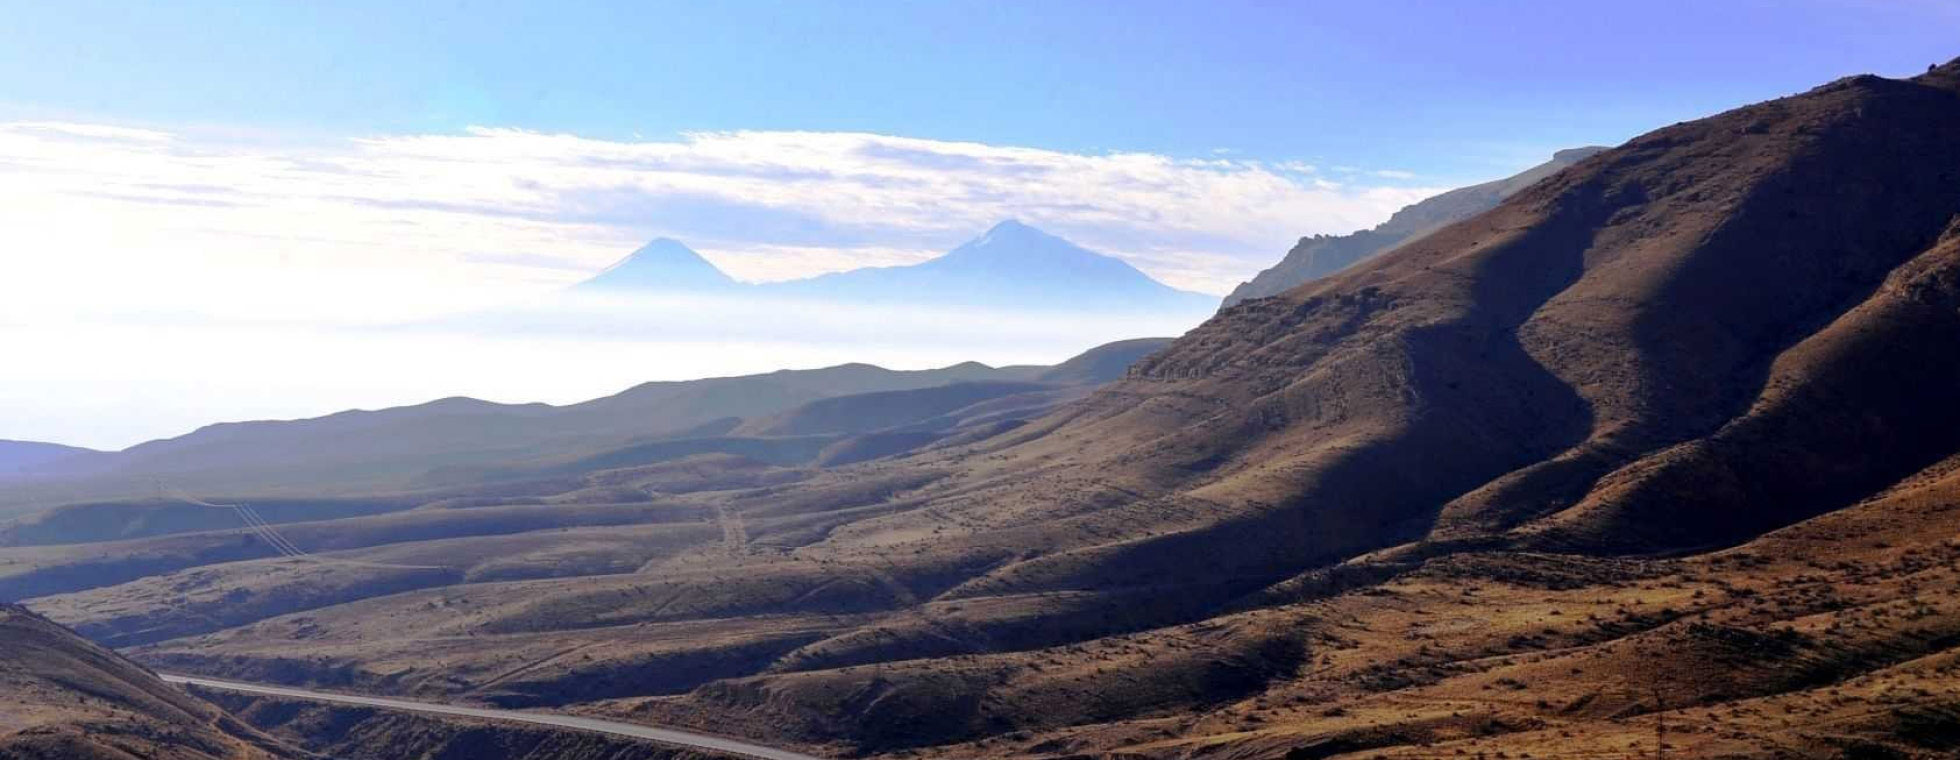 Armenia_Slide_2